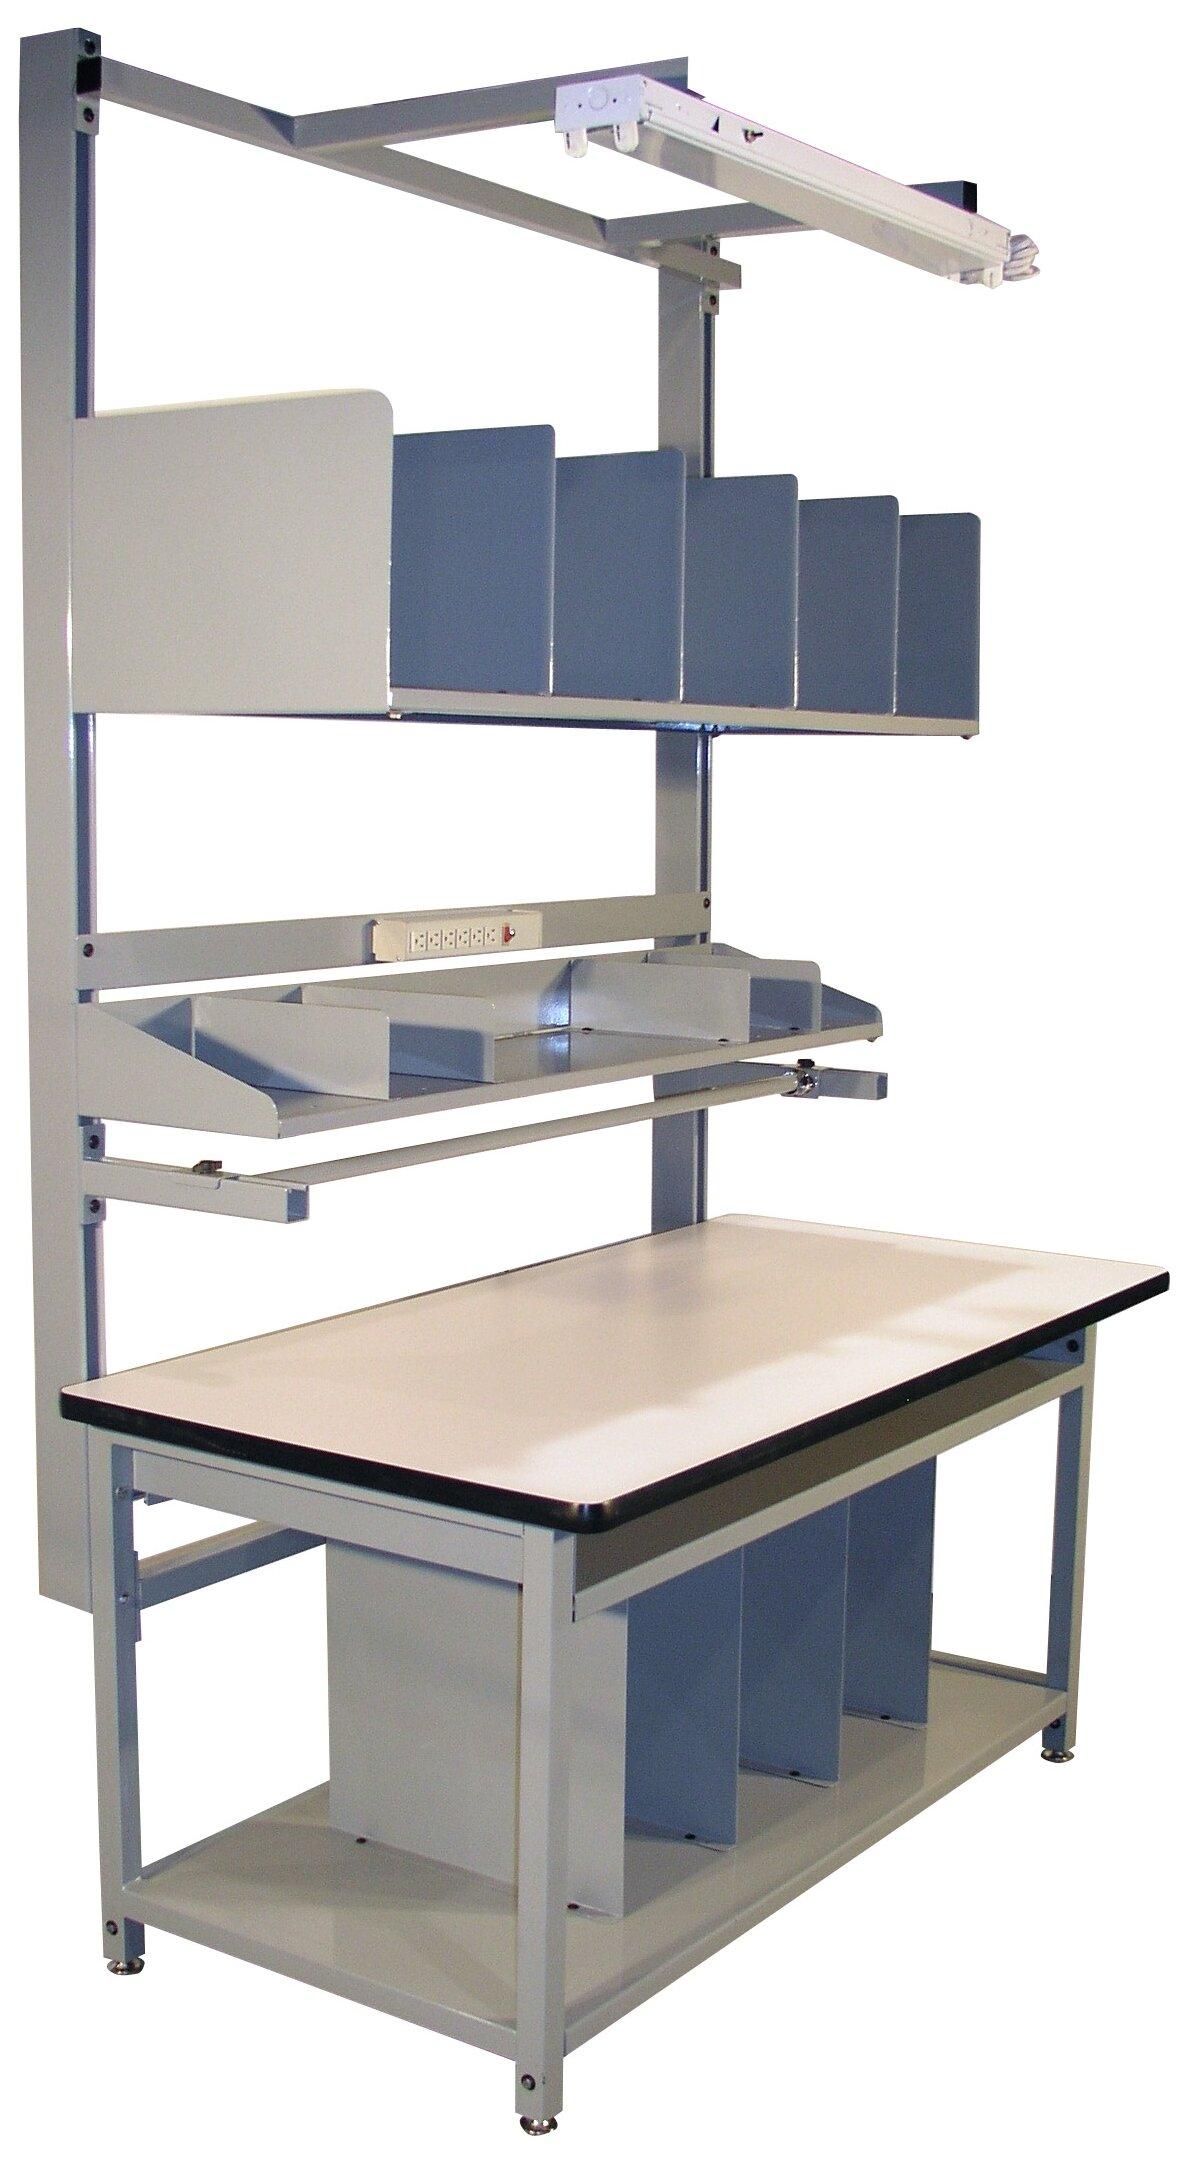 Pro-Line Desk Adjustable Height Workbench | Wayfair